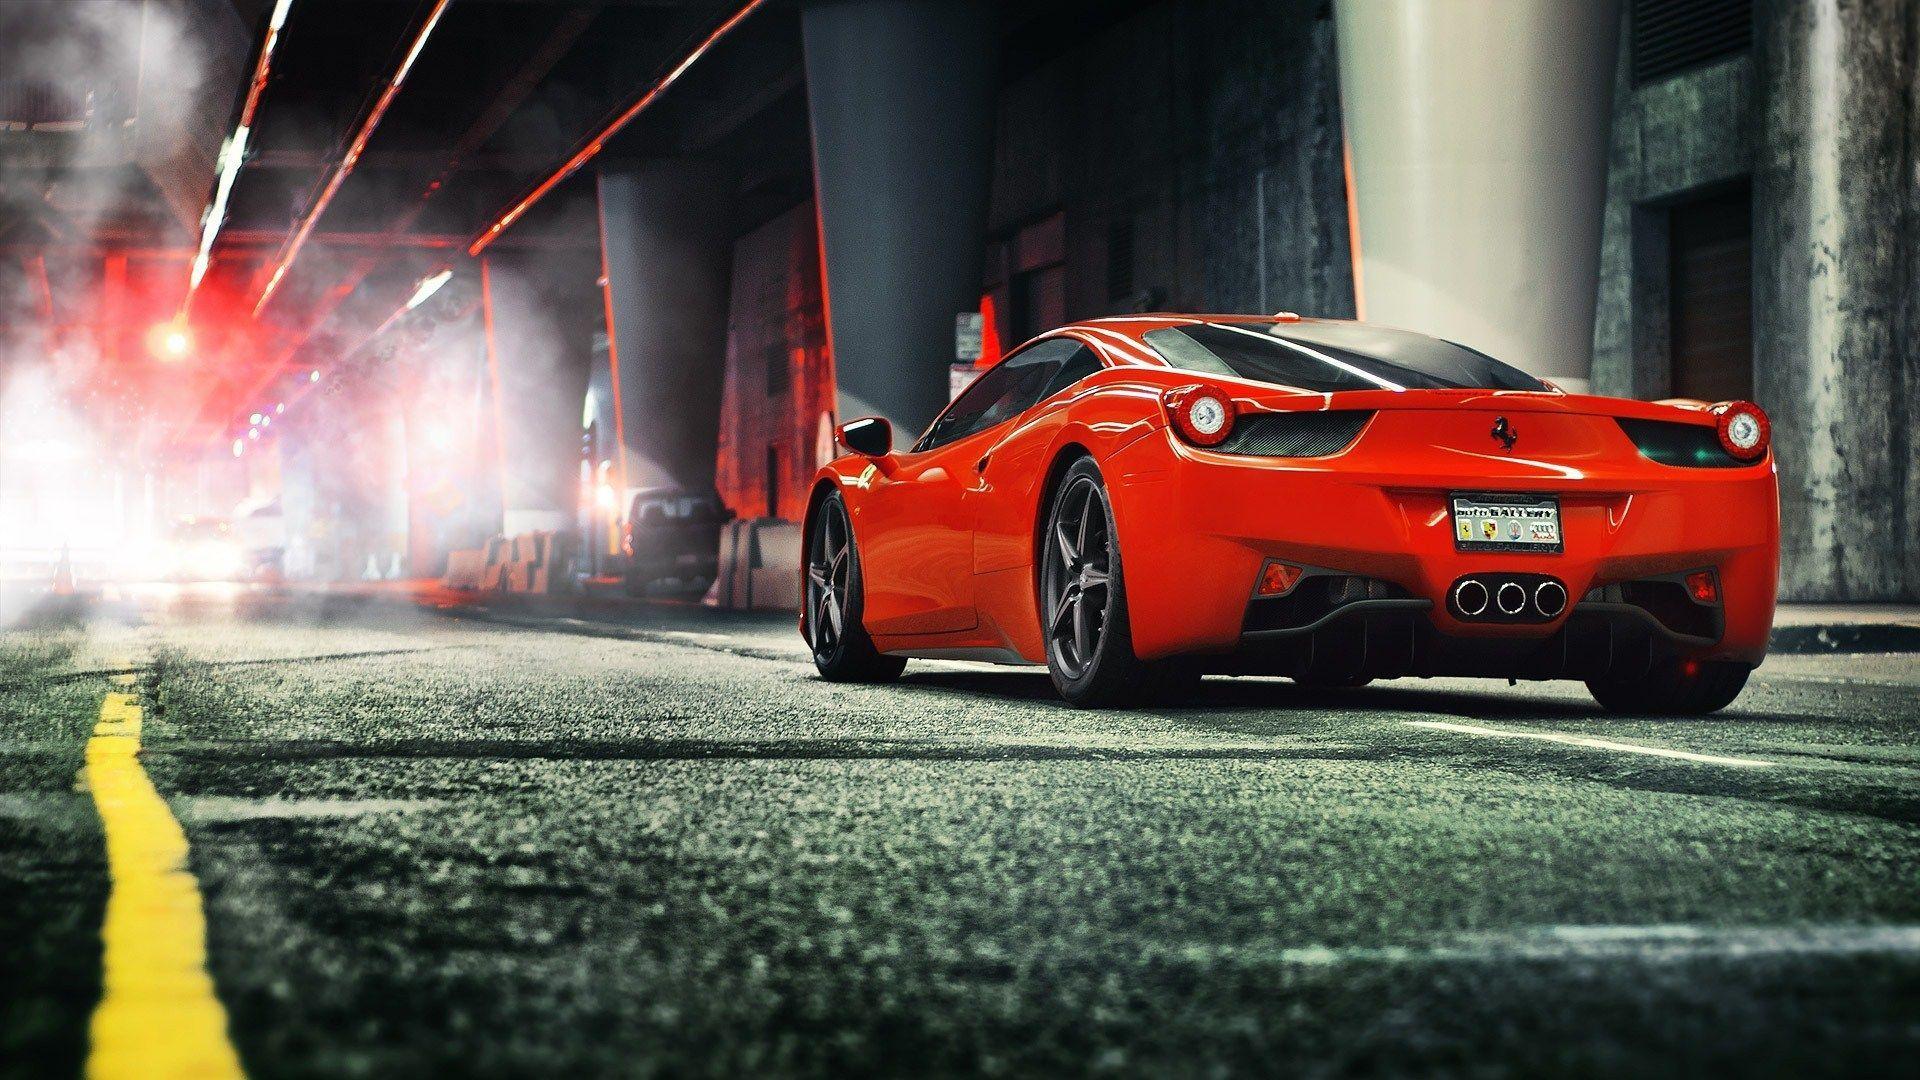 Ferrari 458 Wallpaper 08 1920x1080